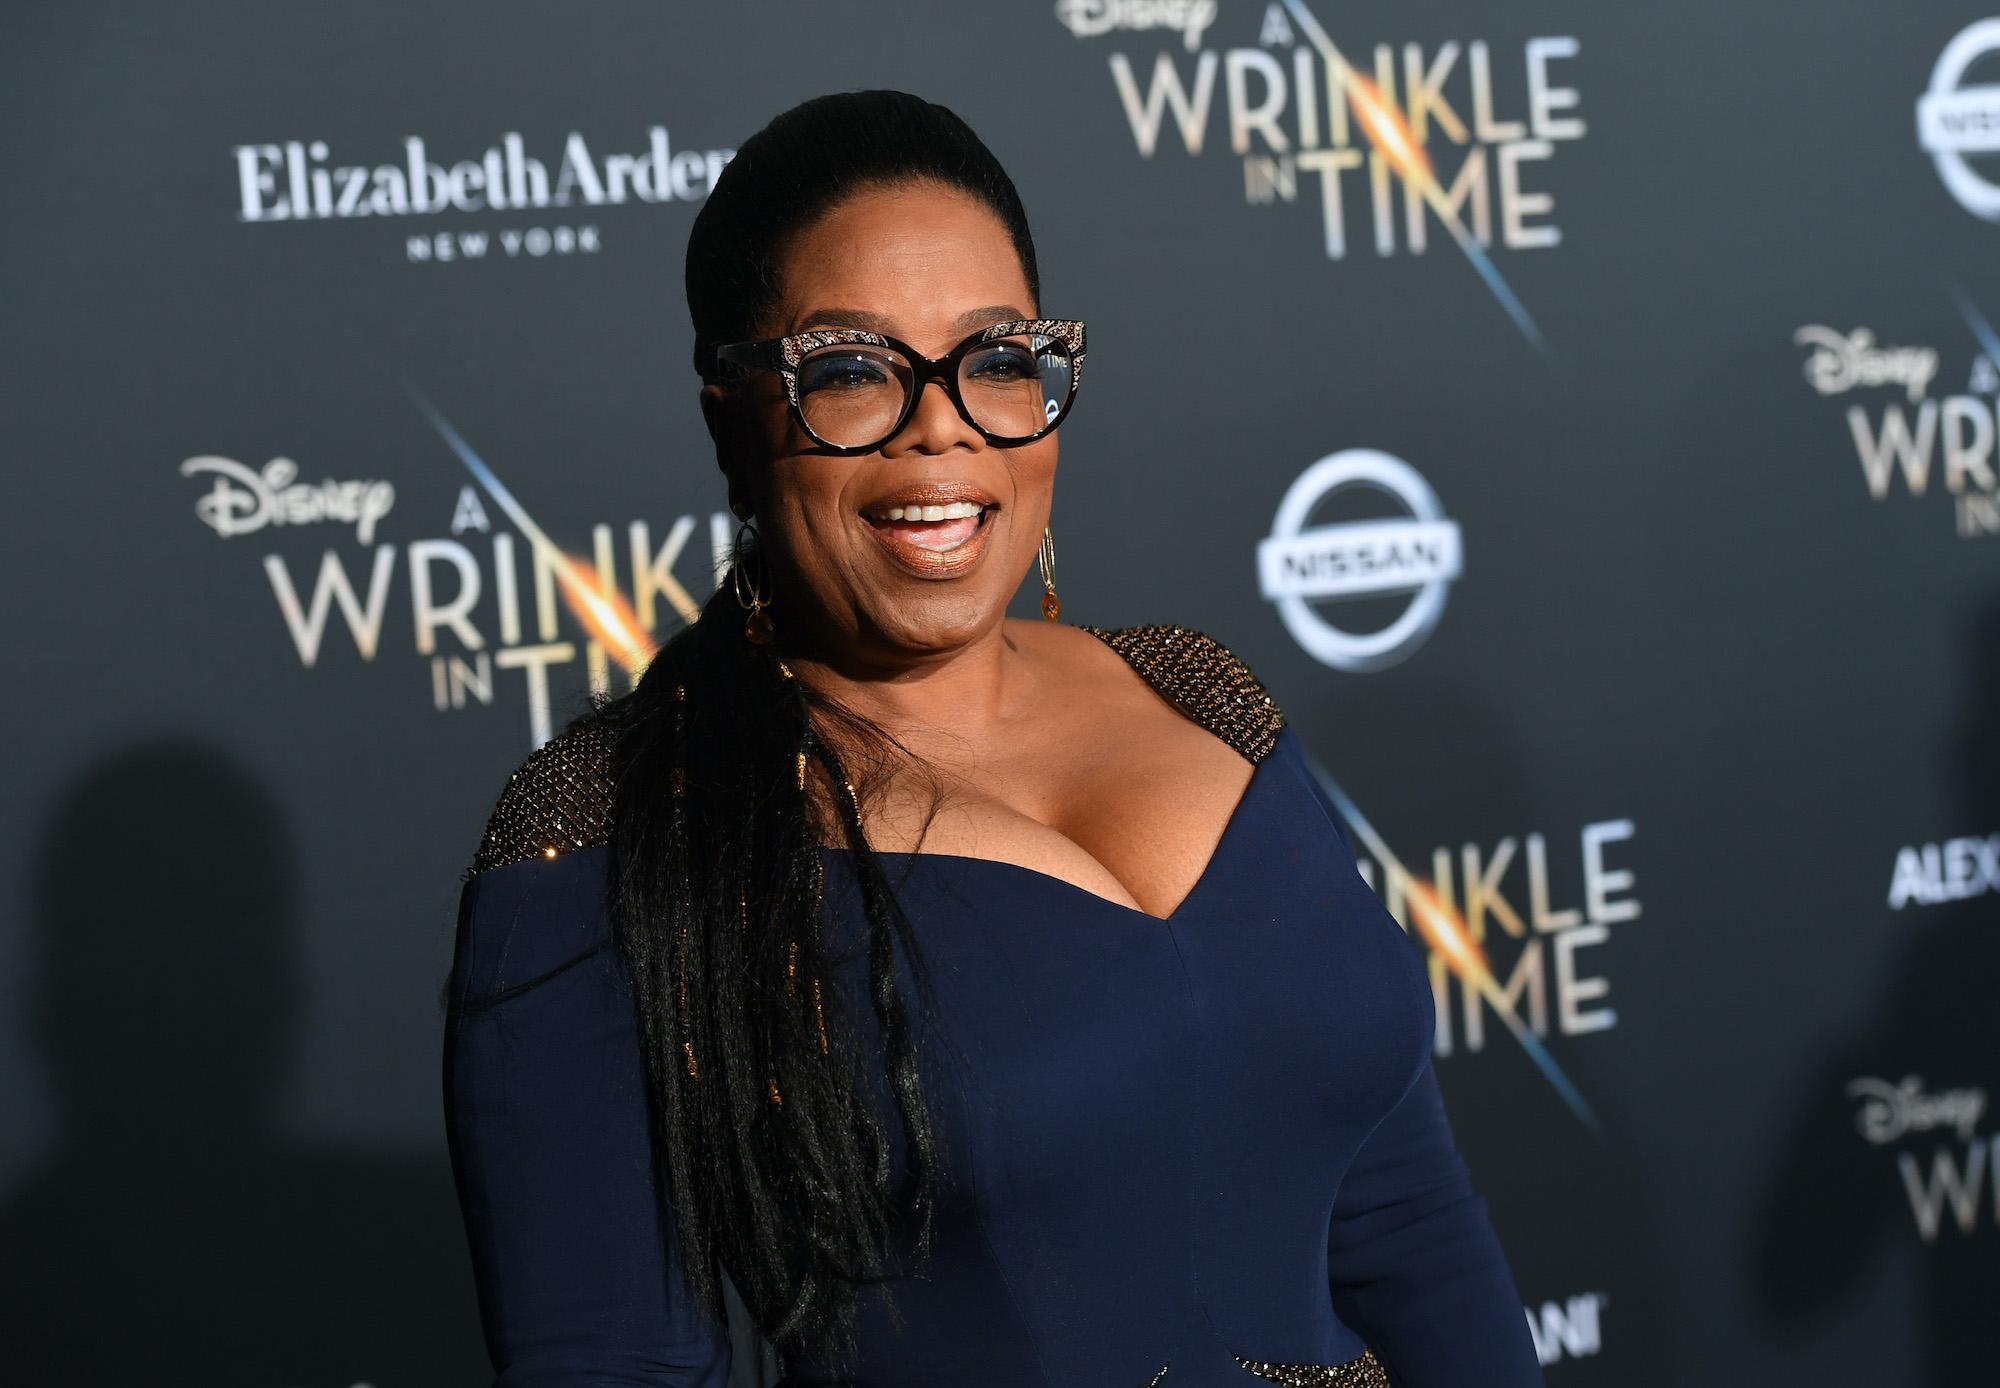 oprah winfrey pierdere în greutate 2021